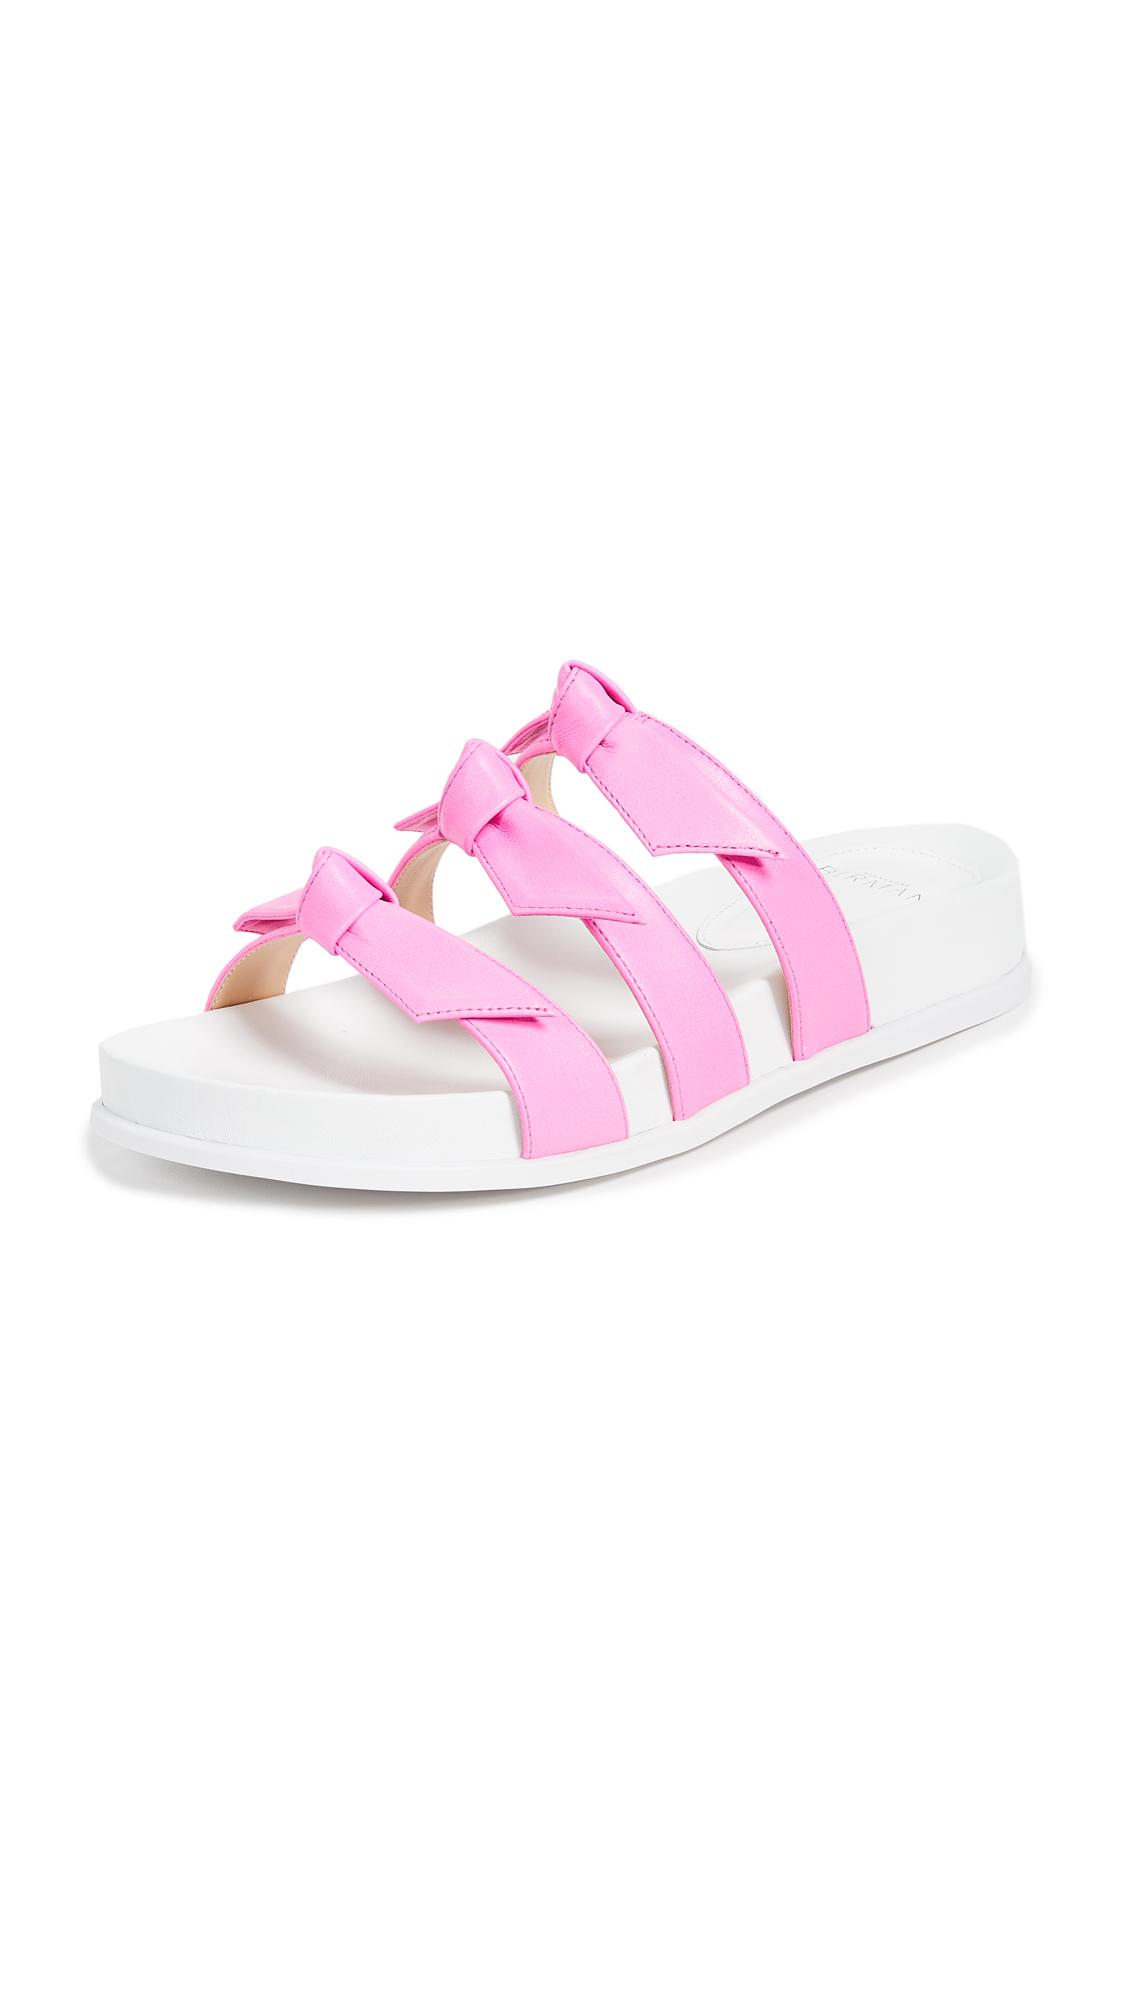 Alexandre Birman Lolita Pool Slides - Pink Fluo/White